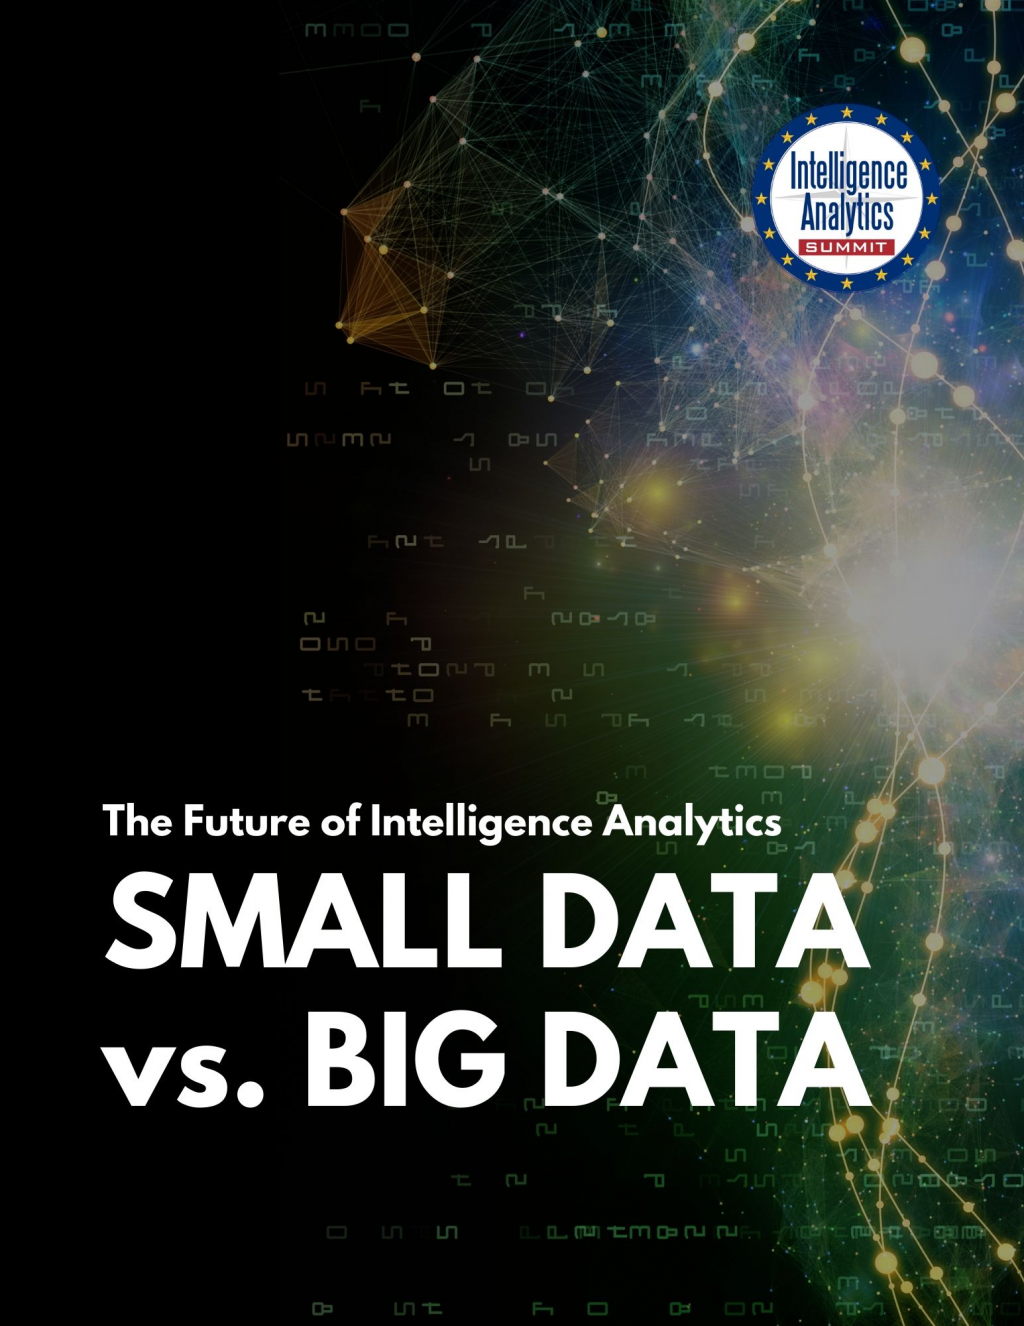 The Future of Intelligence Analytics: Small Data Intelligence vs. Big Data Analysis